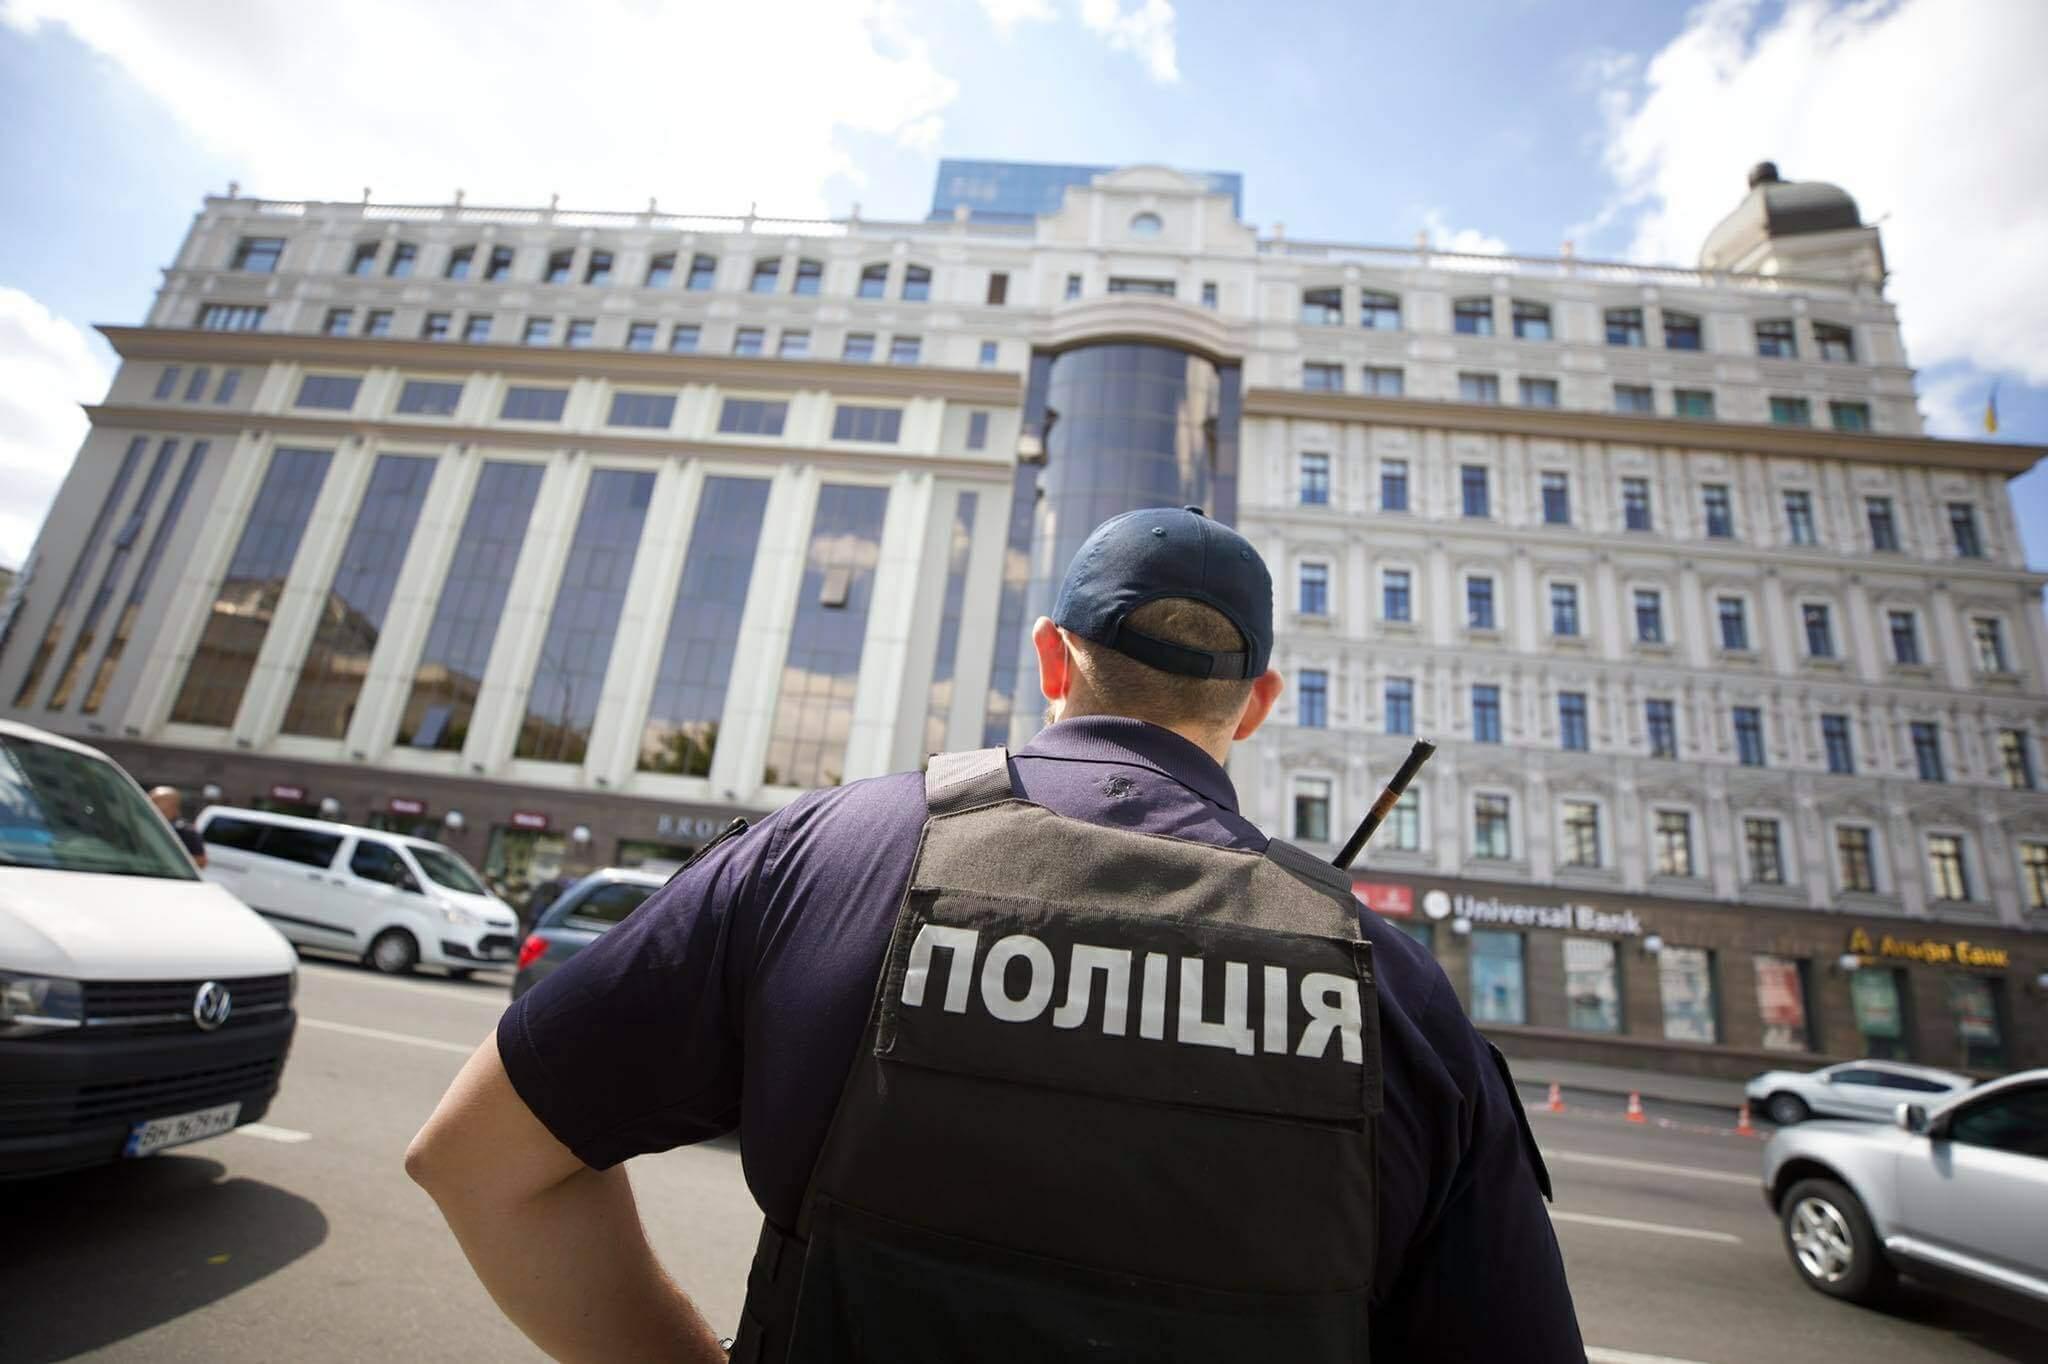 Арестован экс-командир батальона «Донбасс» Семена Семенченко